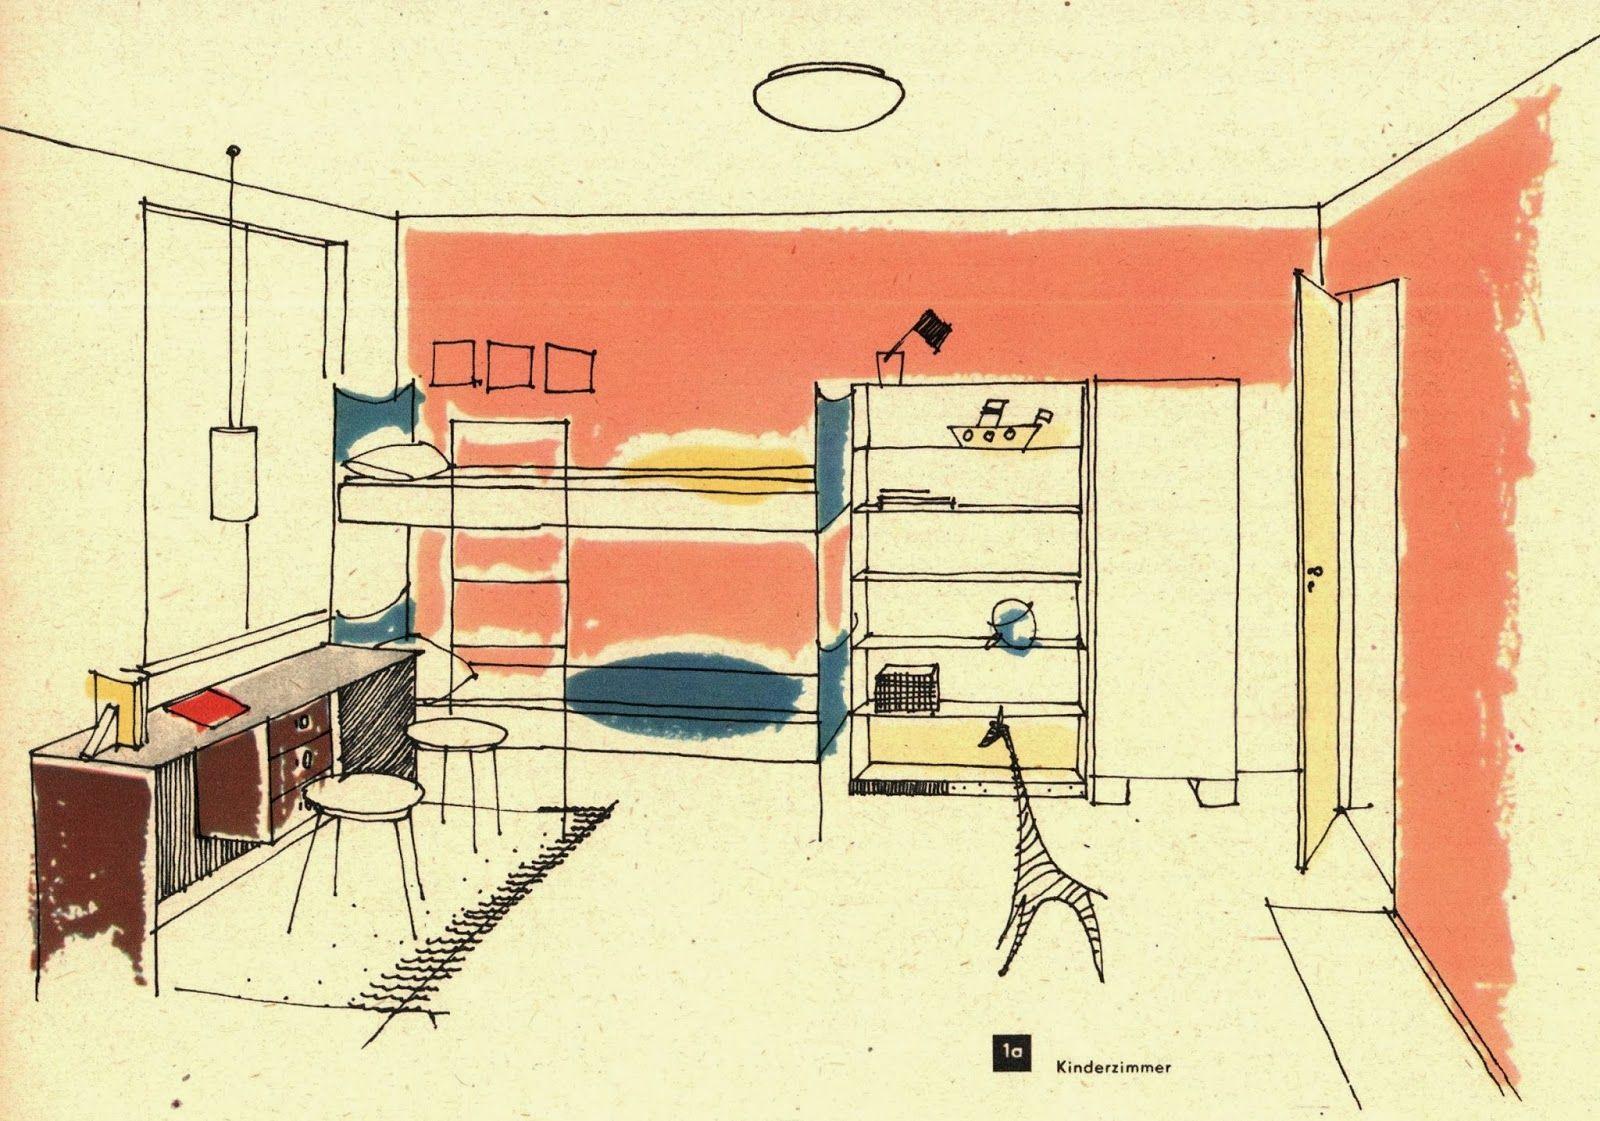 diePuppenstubensammlerin: Kinderzimmer - Paul Hübsch - nursery